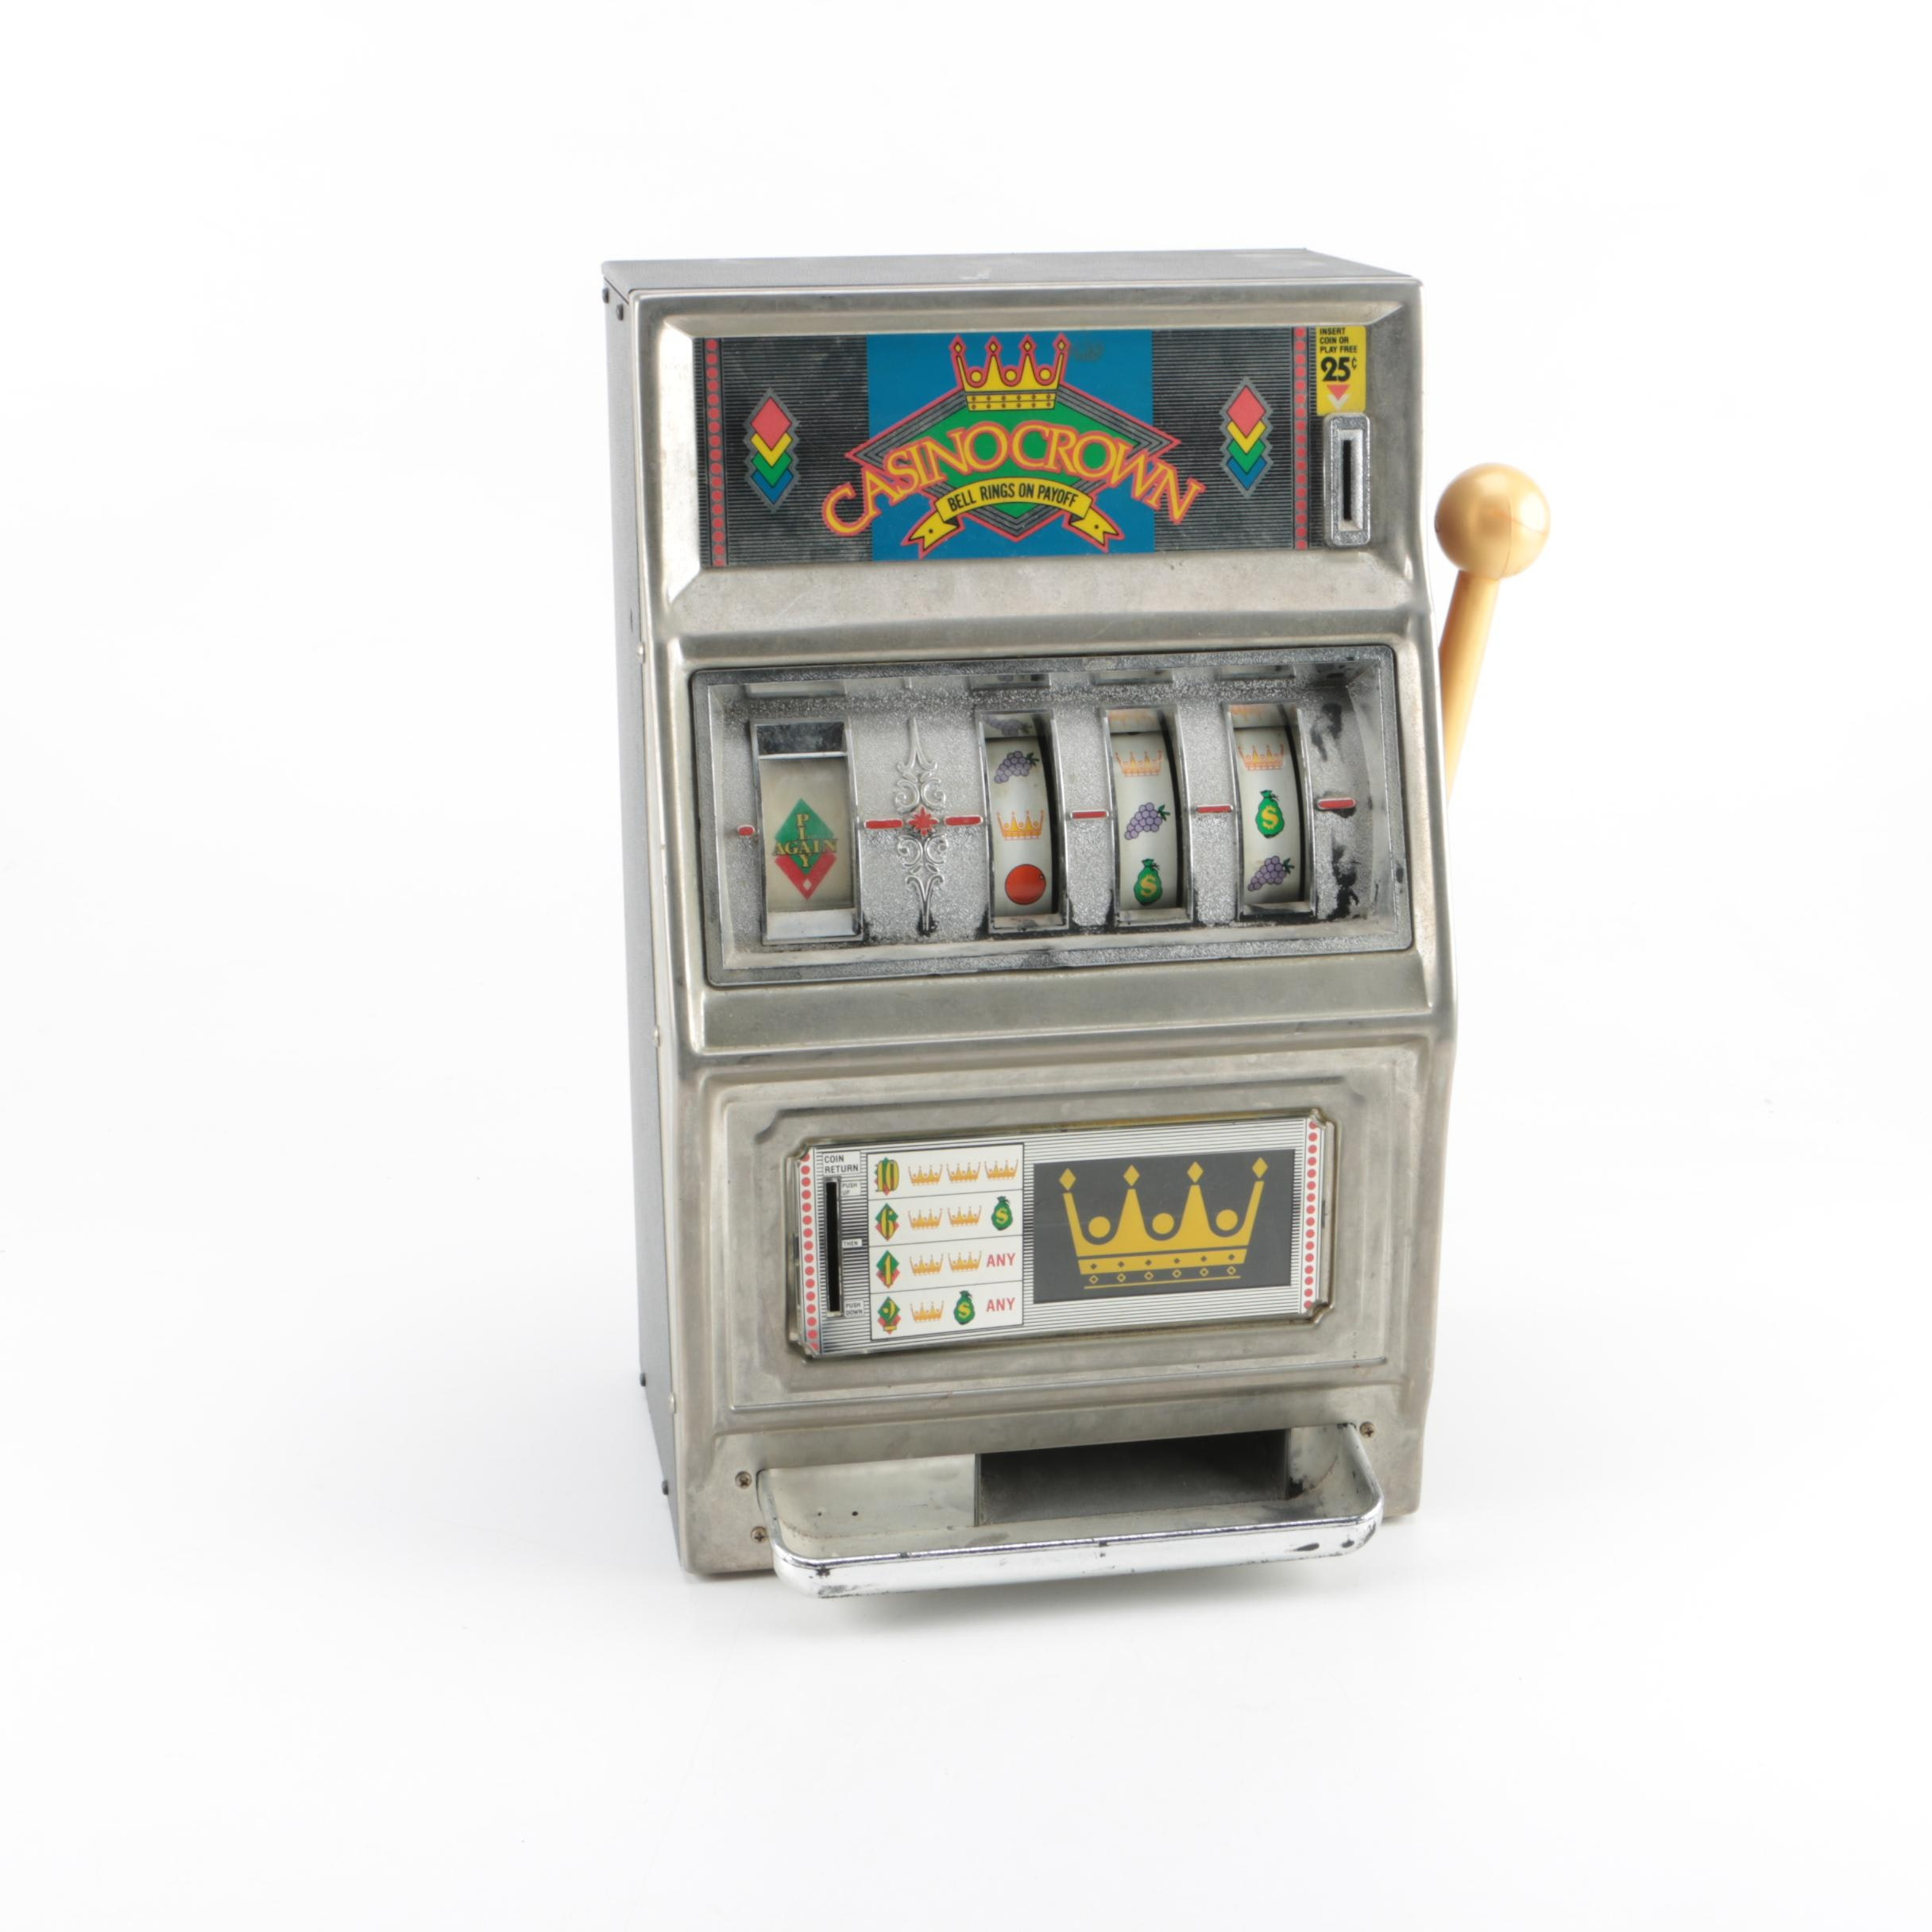 Waco Casino Crown Slot Machine Coin Bank